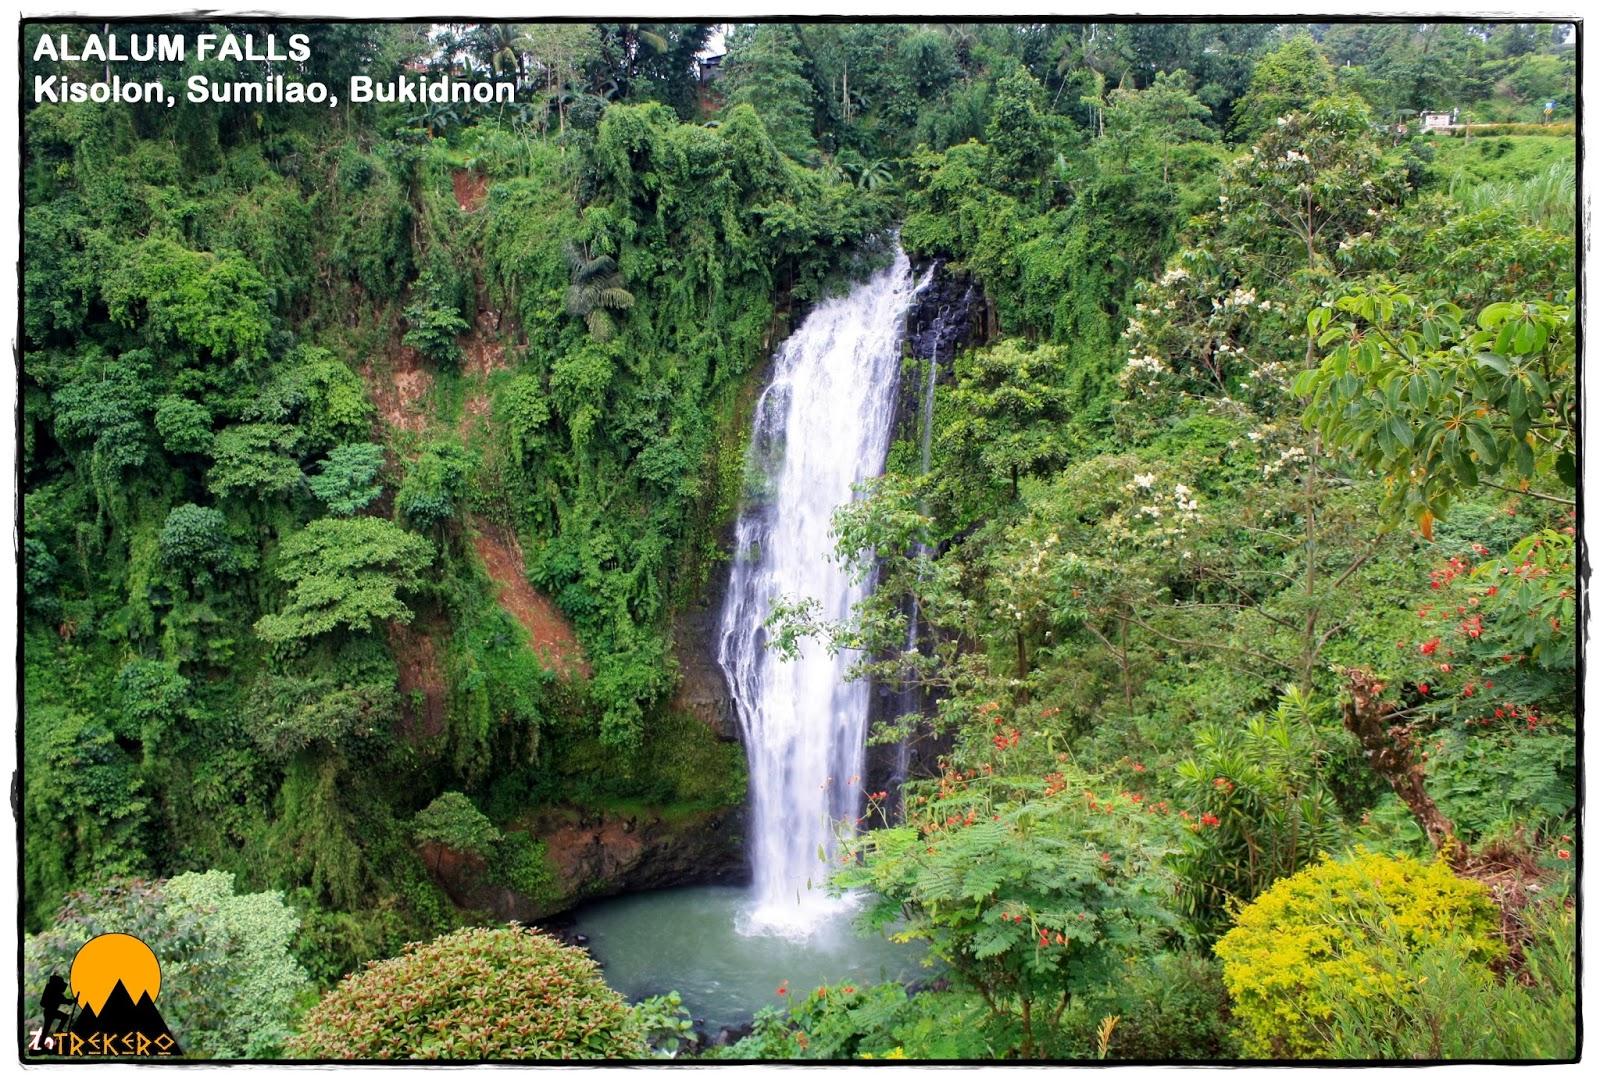 alalum falls by Trekero